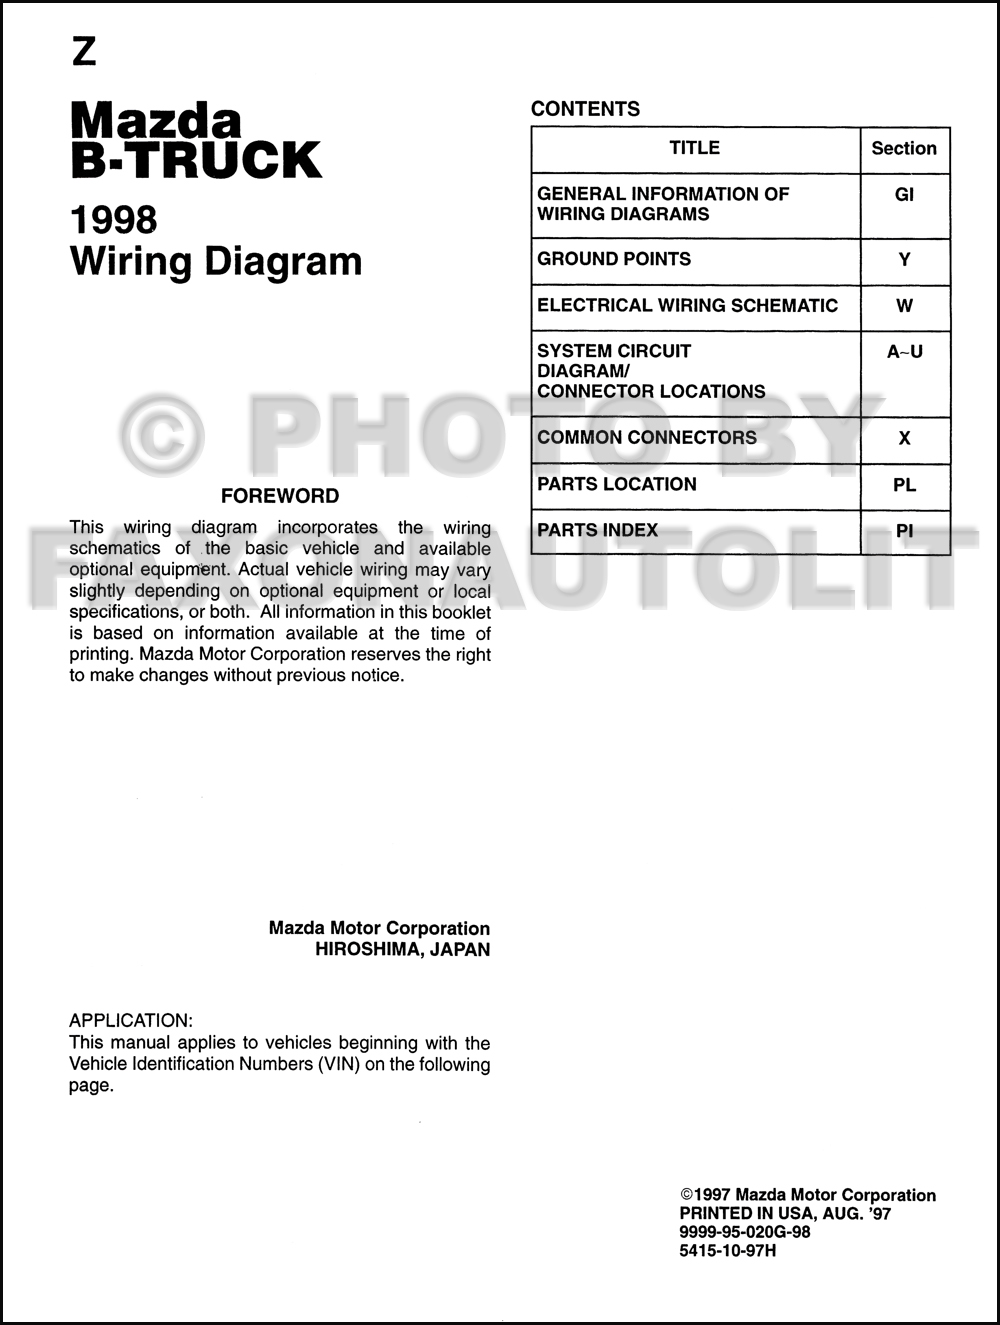 Mazda Truck Wiring Diagram Product Diagrams 2002 Protege5 1998 B4000 B3000 B2500 Pickup Manual Rh Faxonautoliterature Com